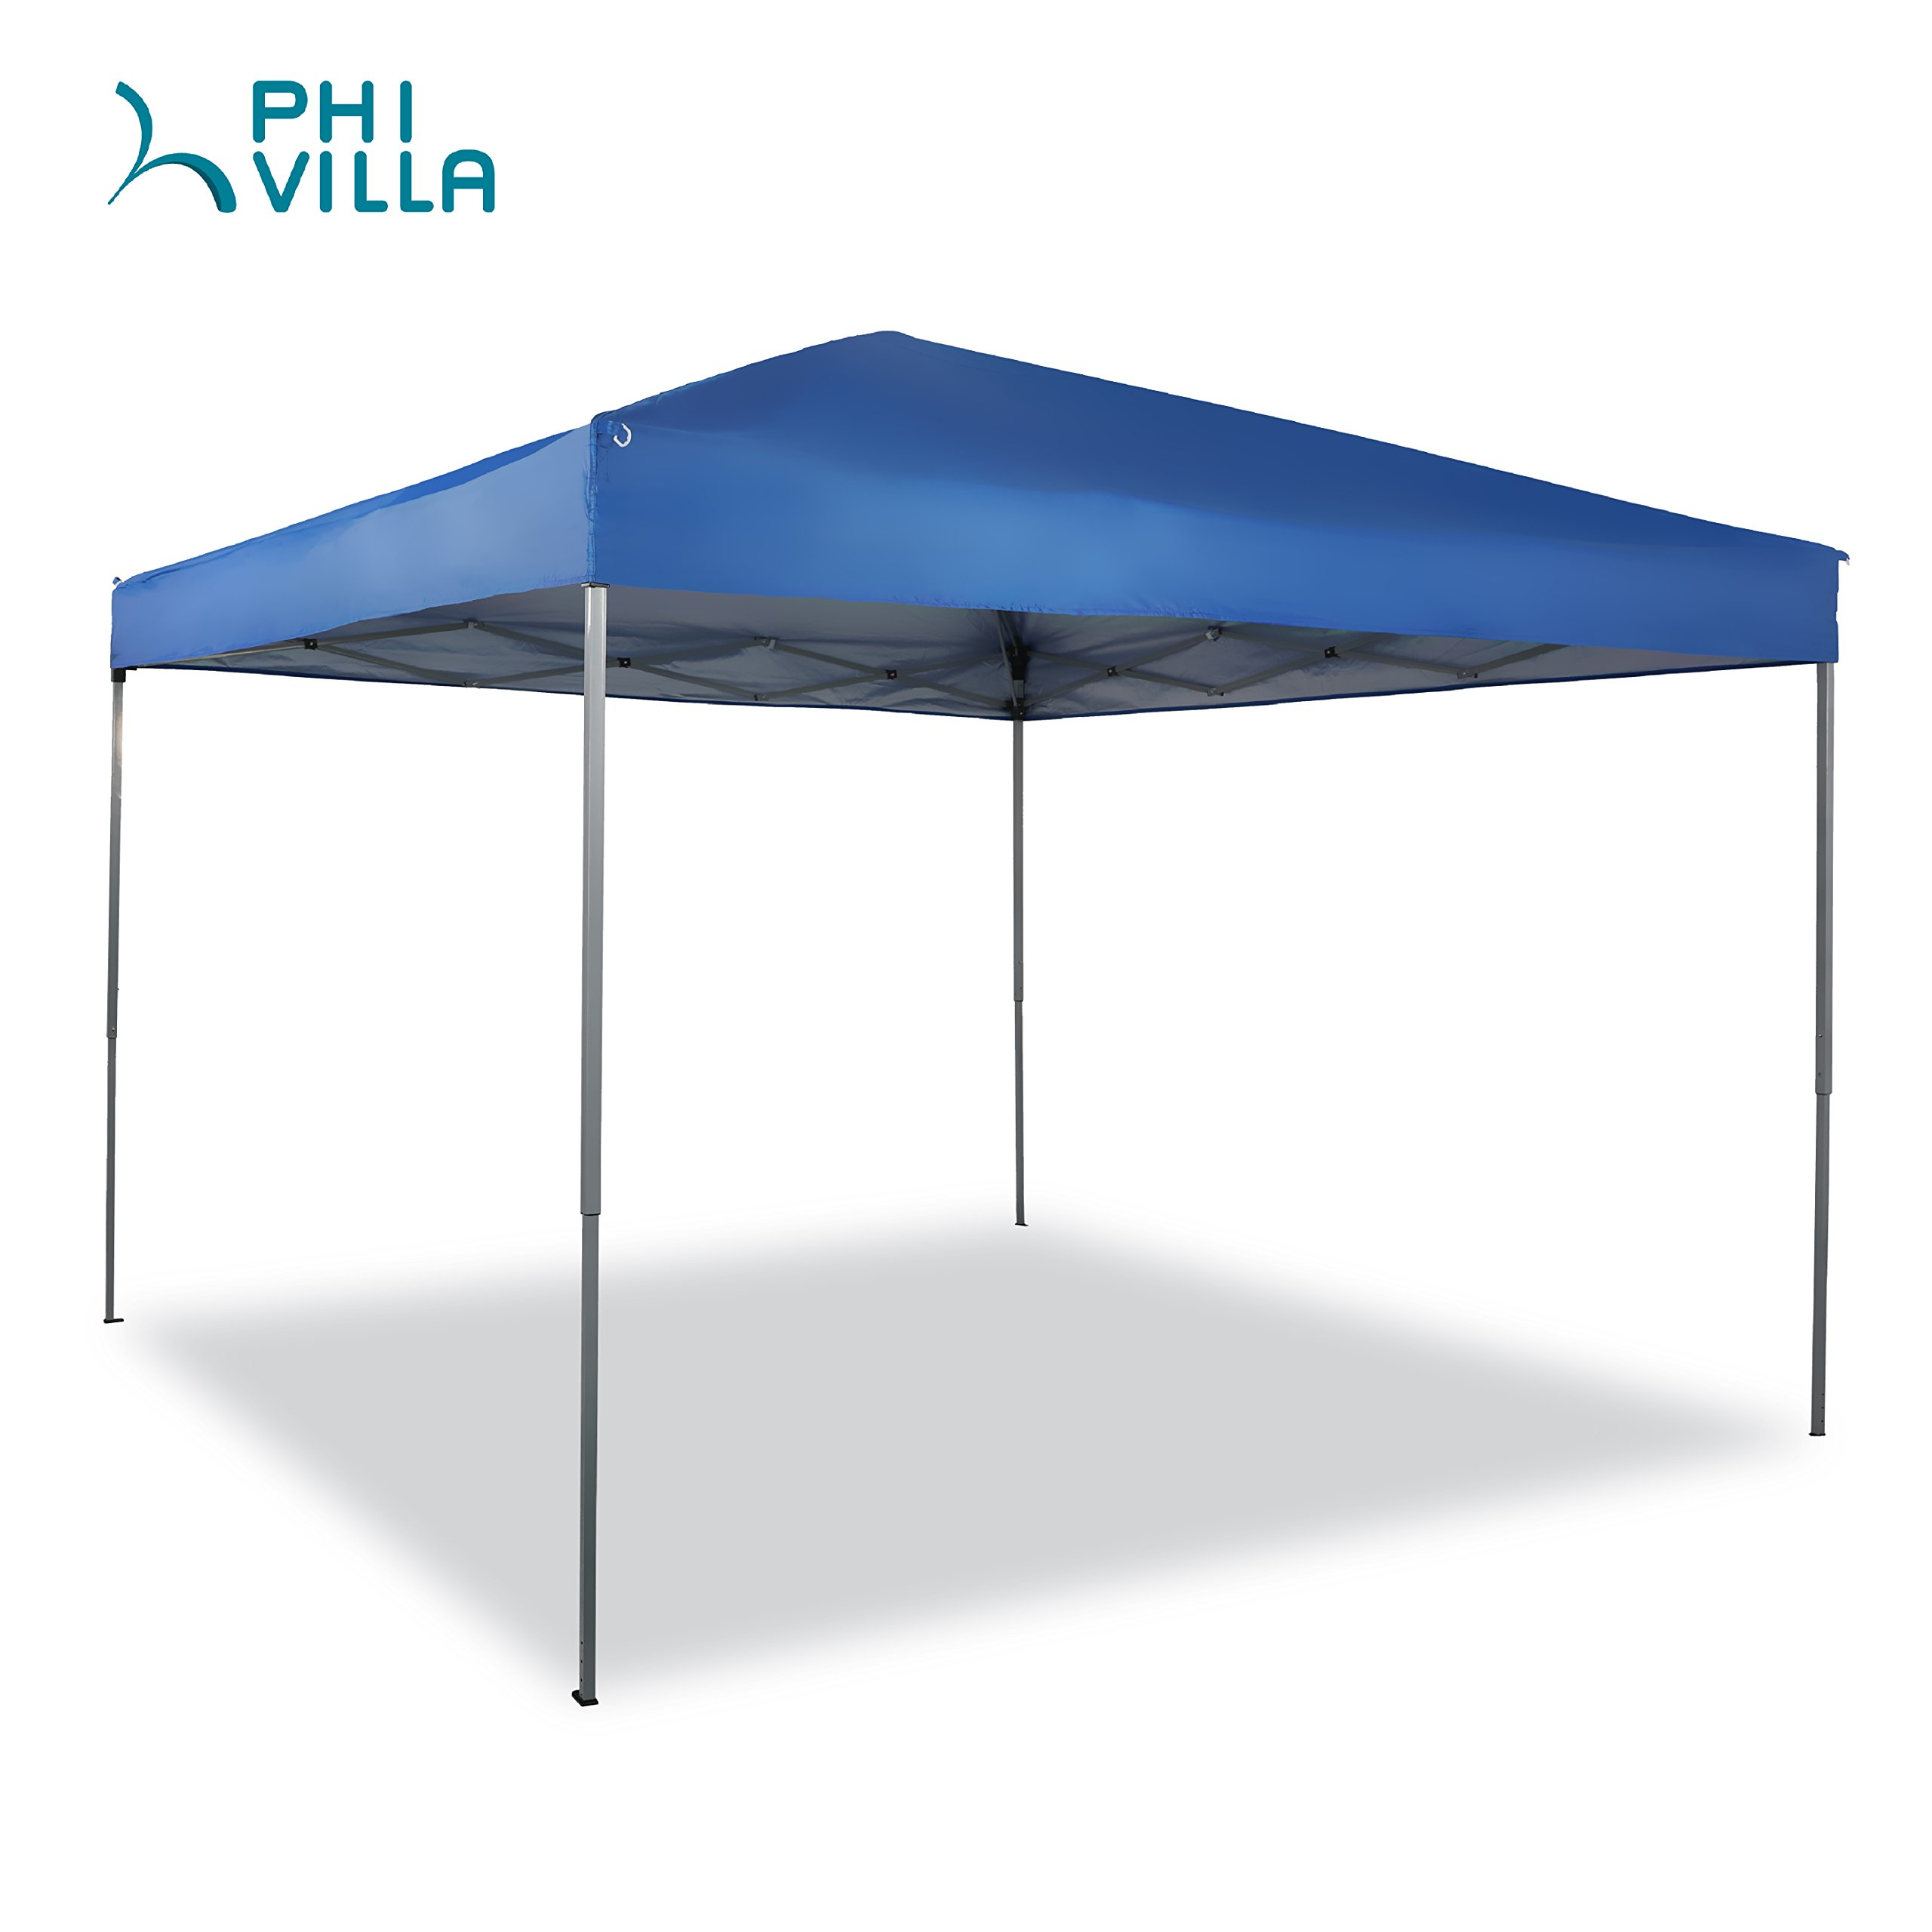 PHI VILLA 10 x 10 ft Portable Pop-Up Canopy Straight Leg, 100 Sq. Ft of Shade, Blue